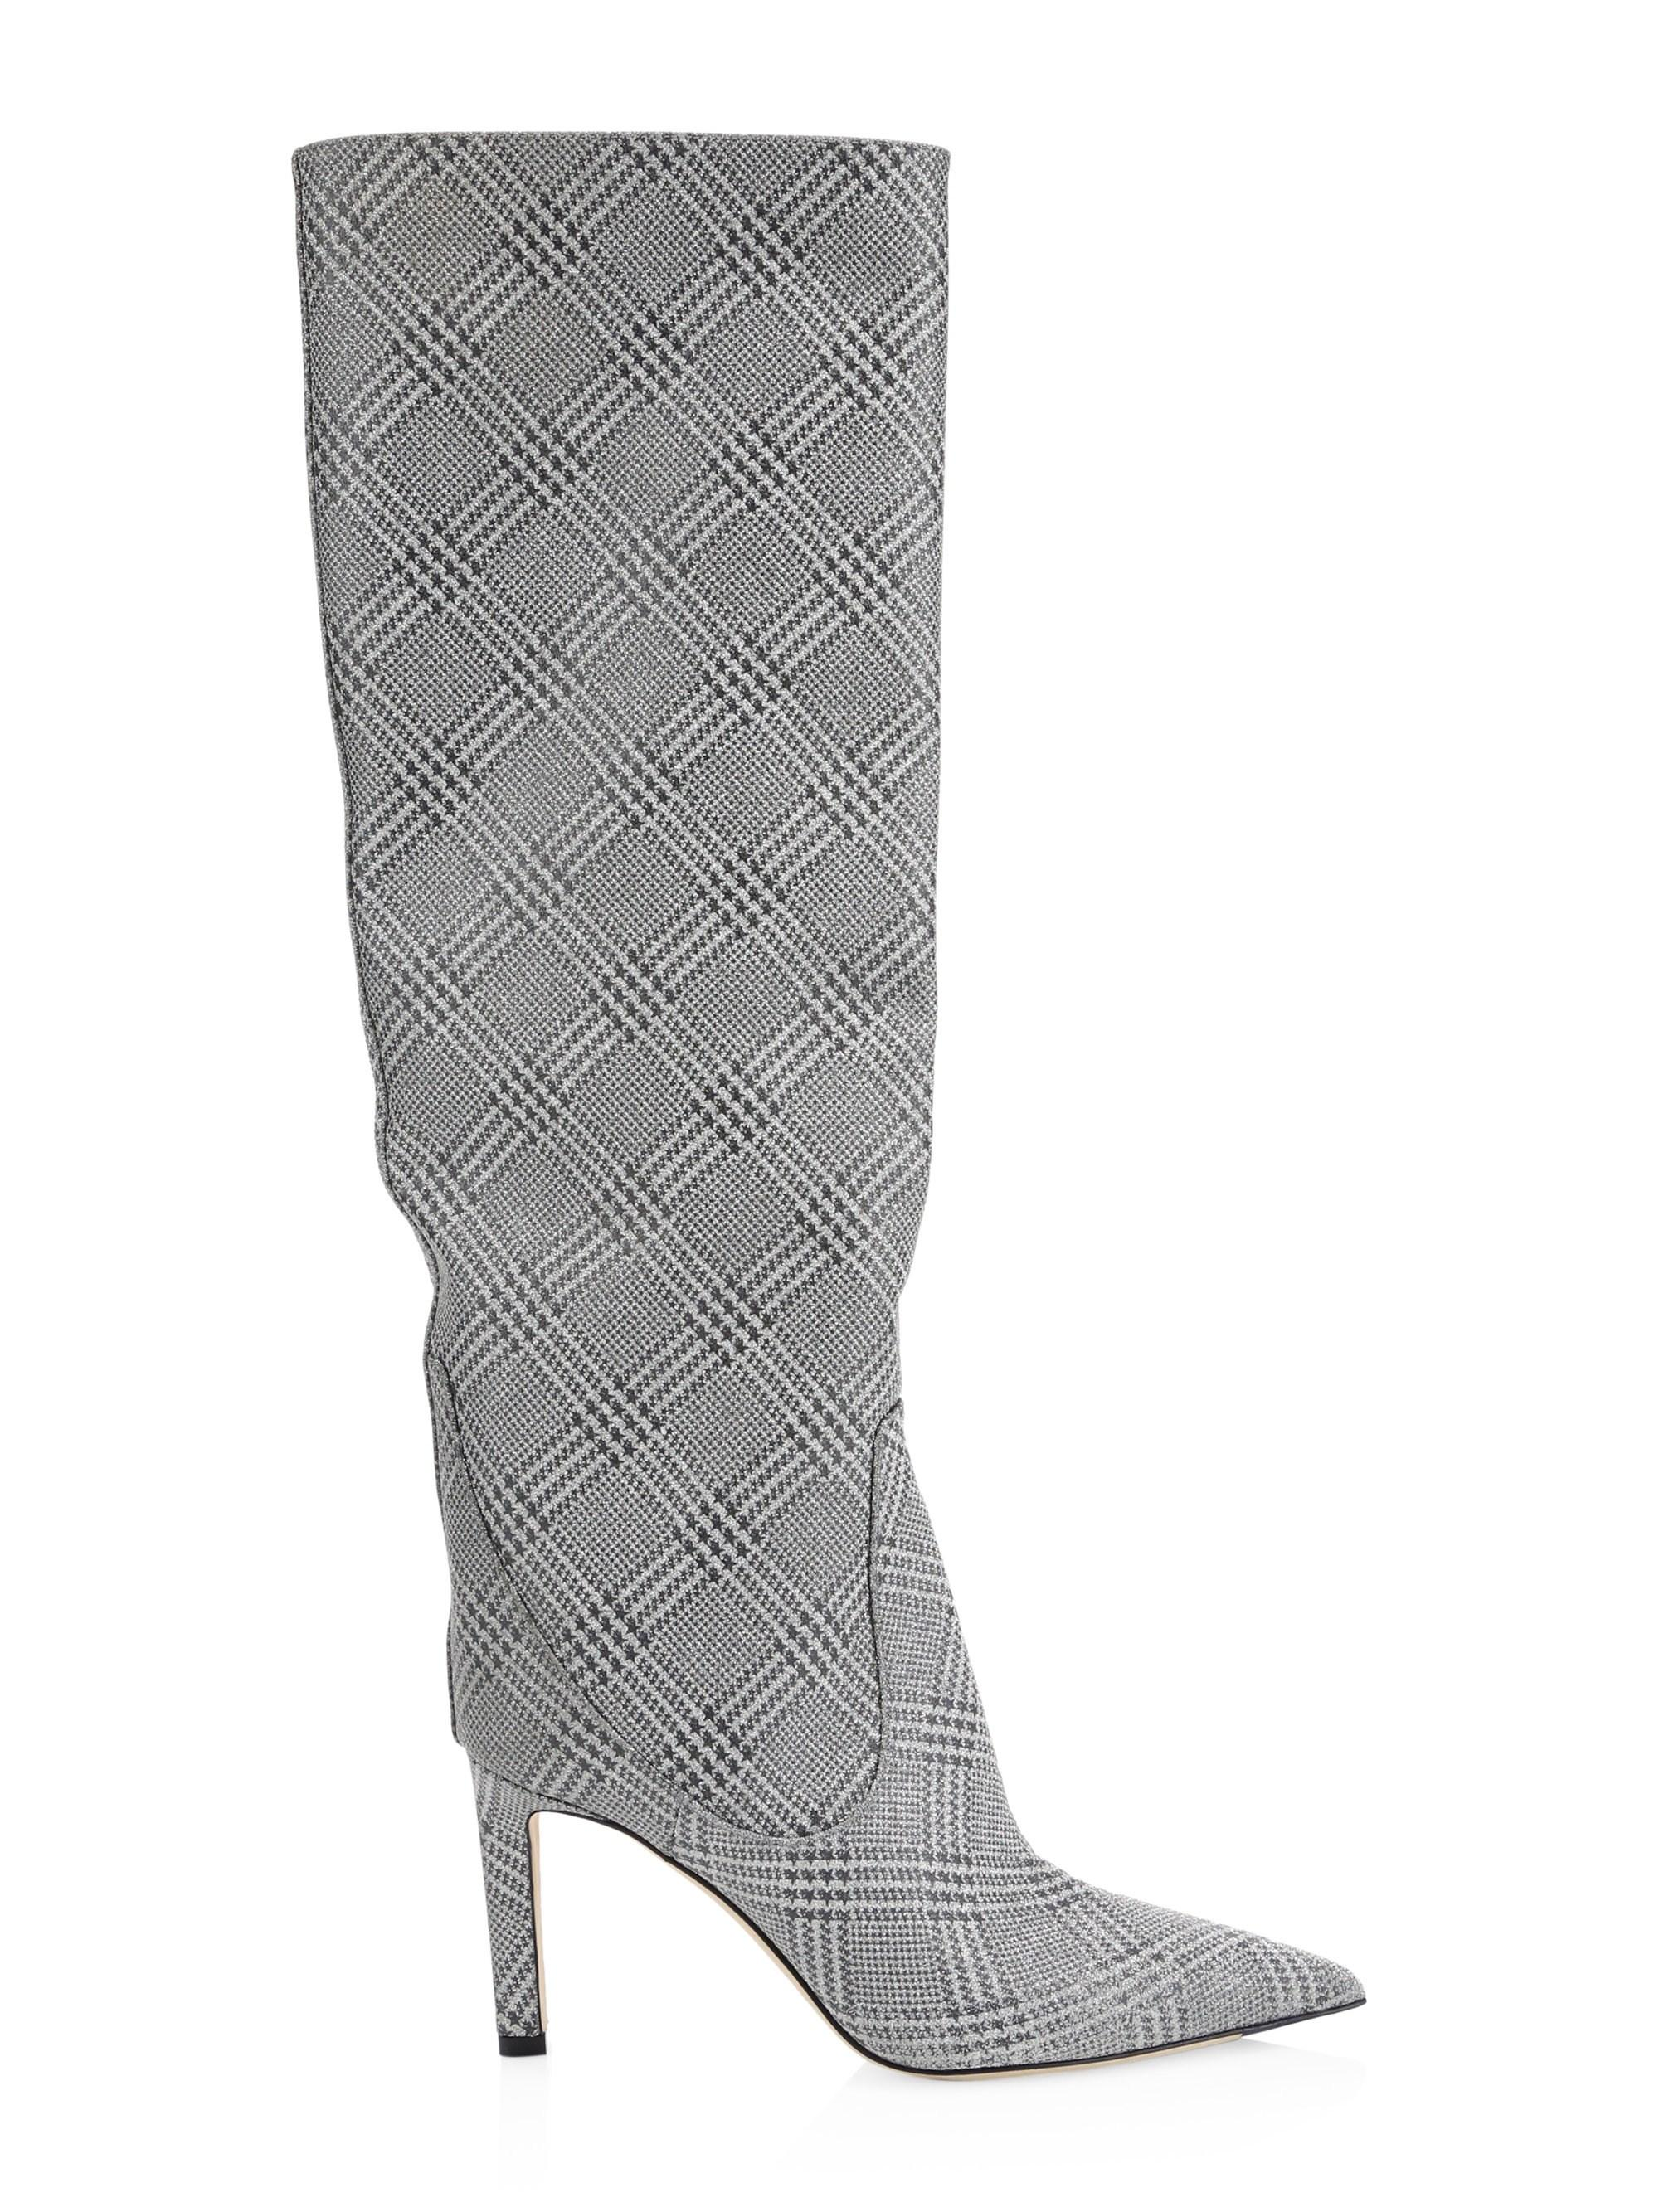 cc827fa9768 Lyst - Jimmy Choo Mavis 100 Knee High Boots in Metallic